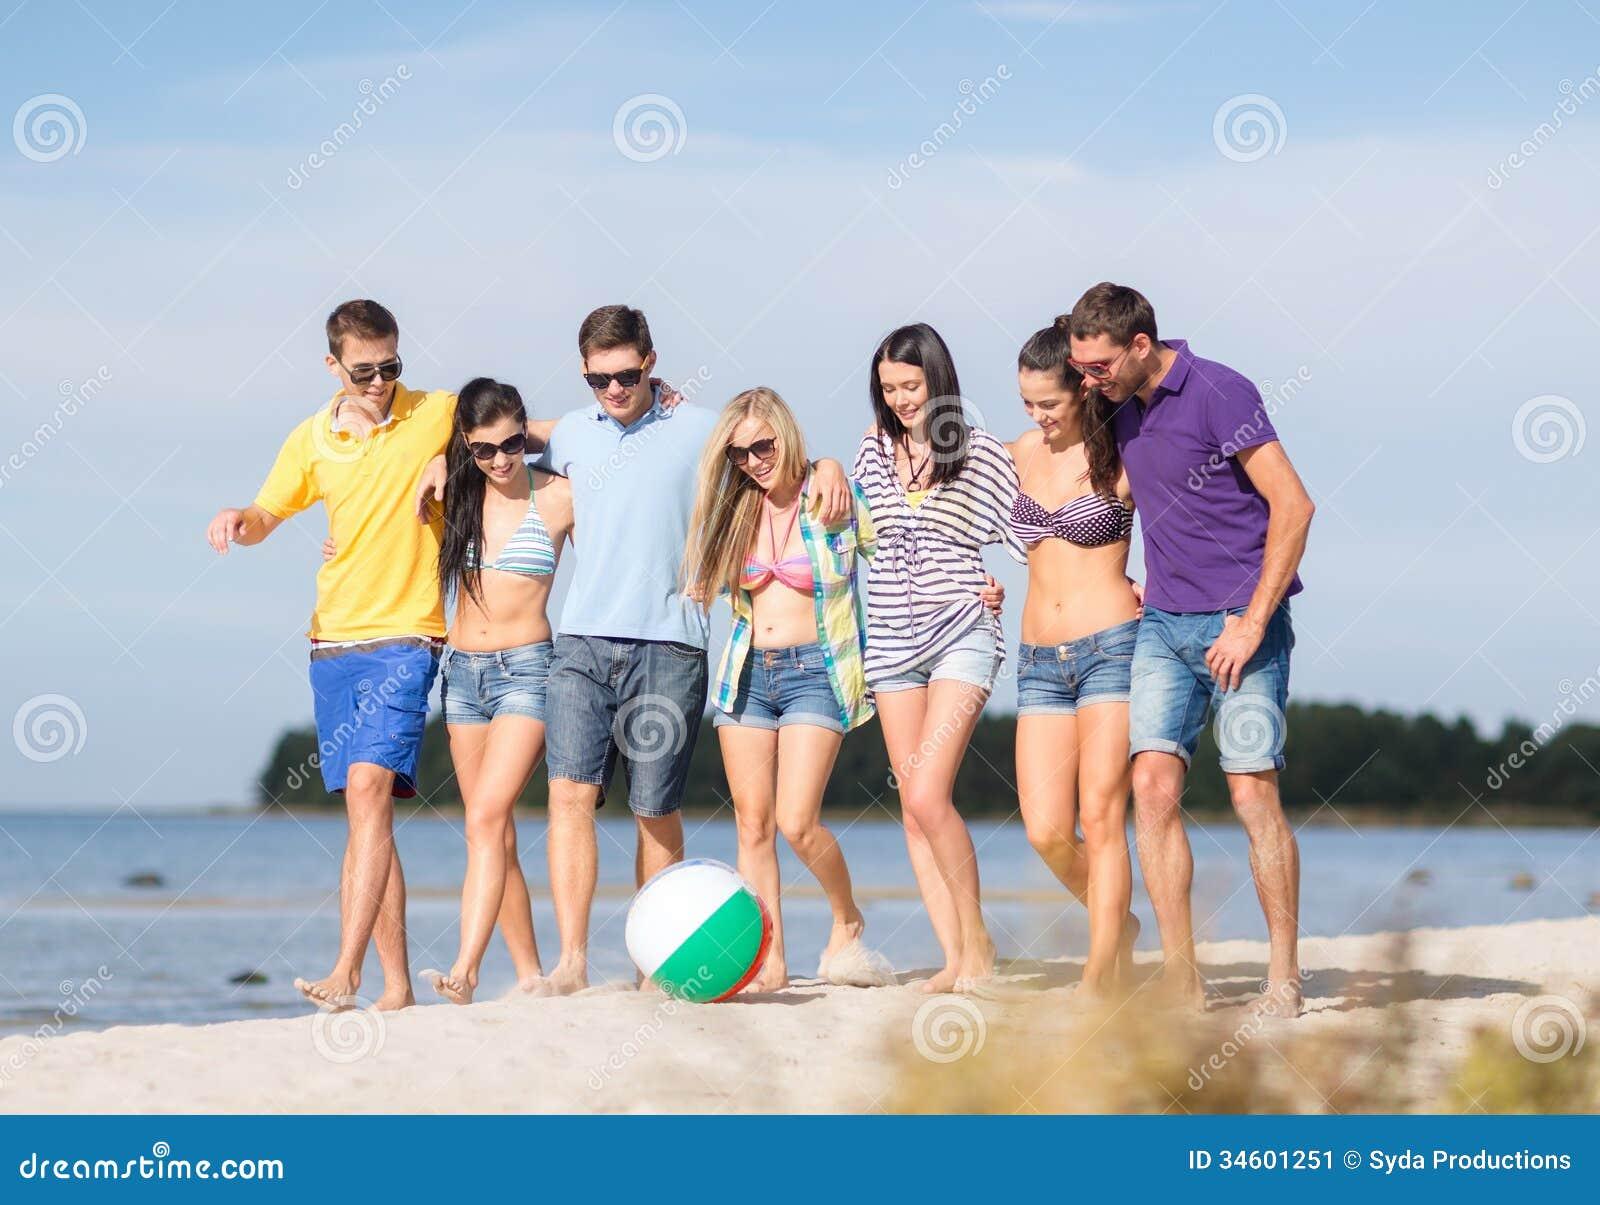 Fun Beach Group on